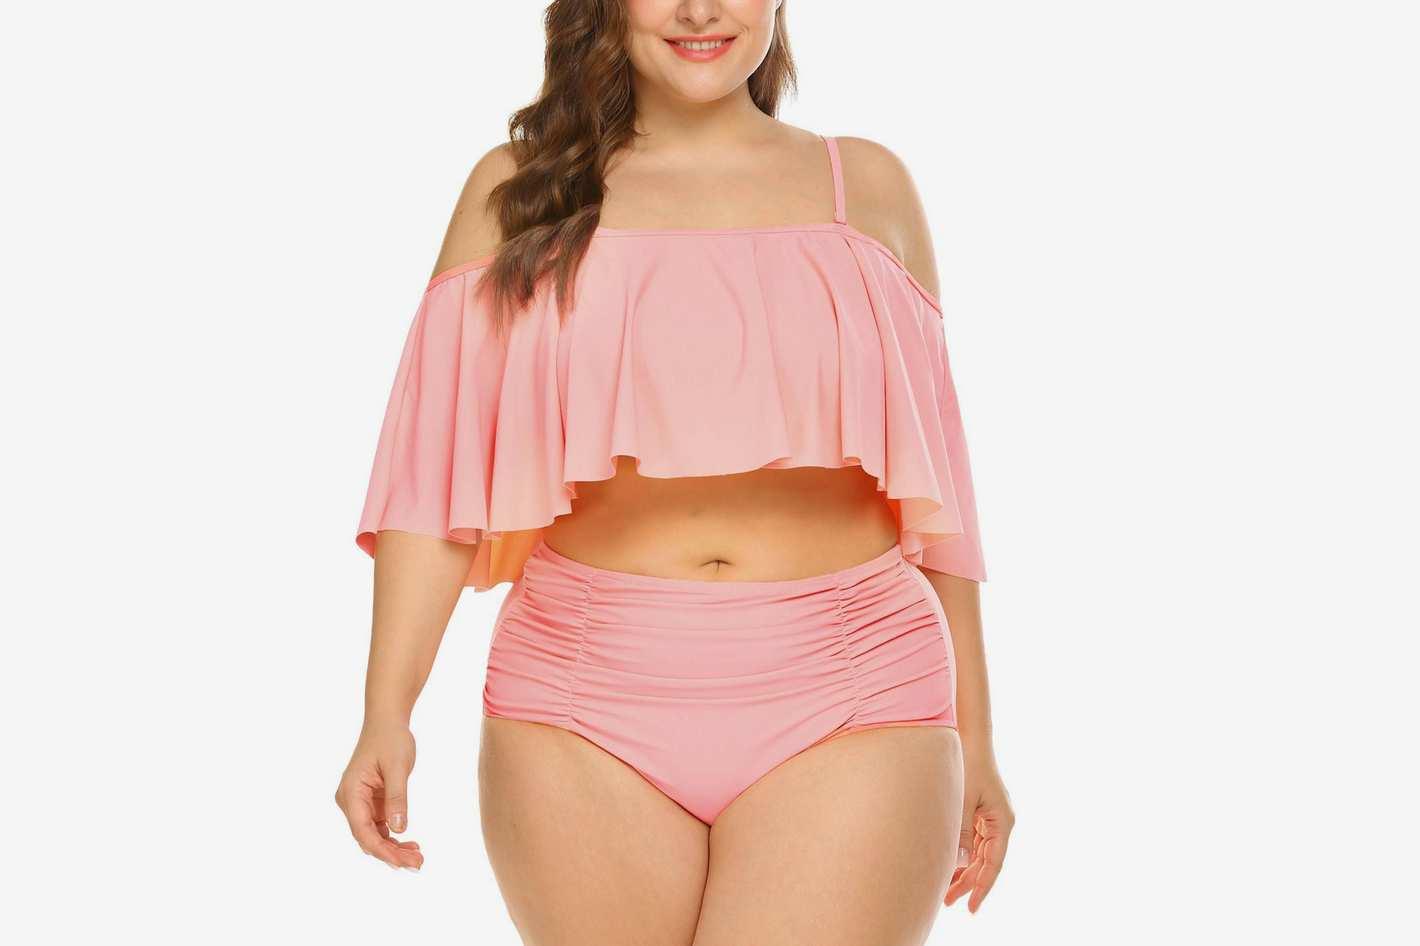 IN'VOLAND Plus Size High Waisted Ruffled Flounce Bikini